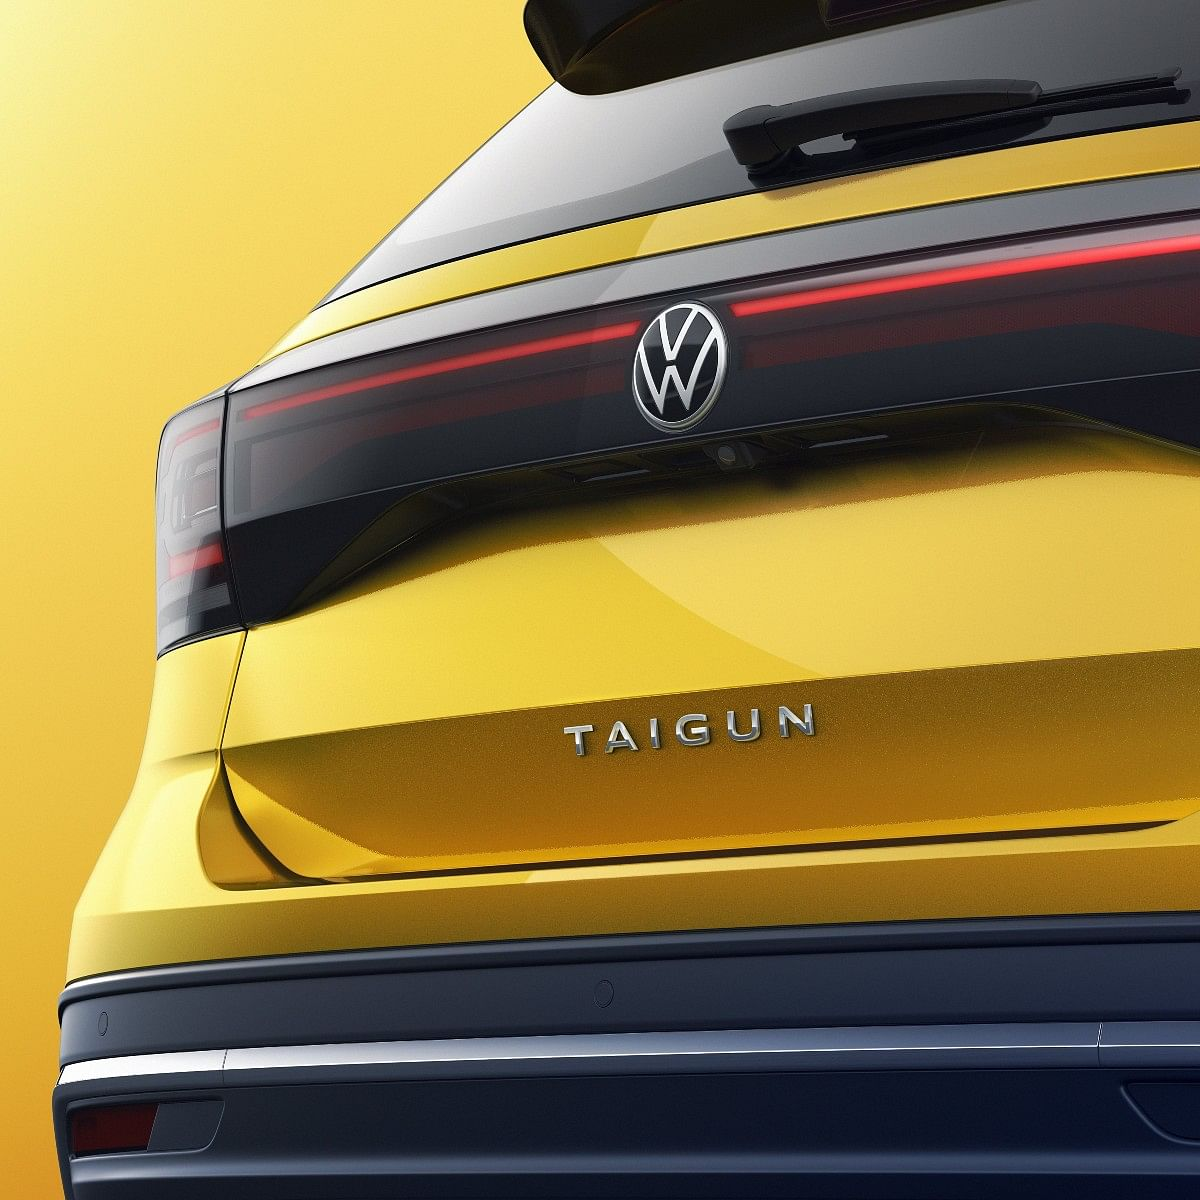 The Volkswagen Taigun gets a distinct full-length LED light bar at the rear